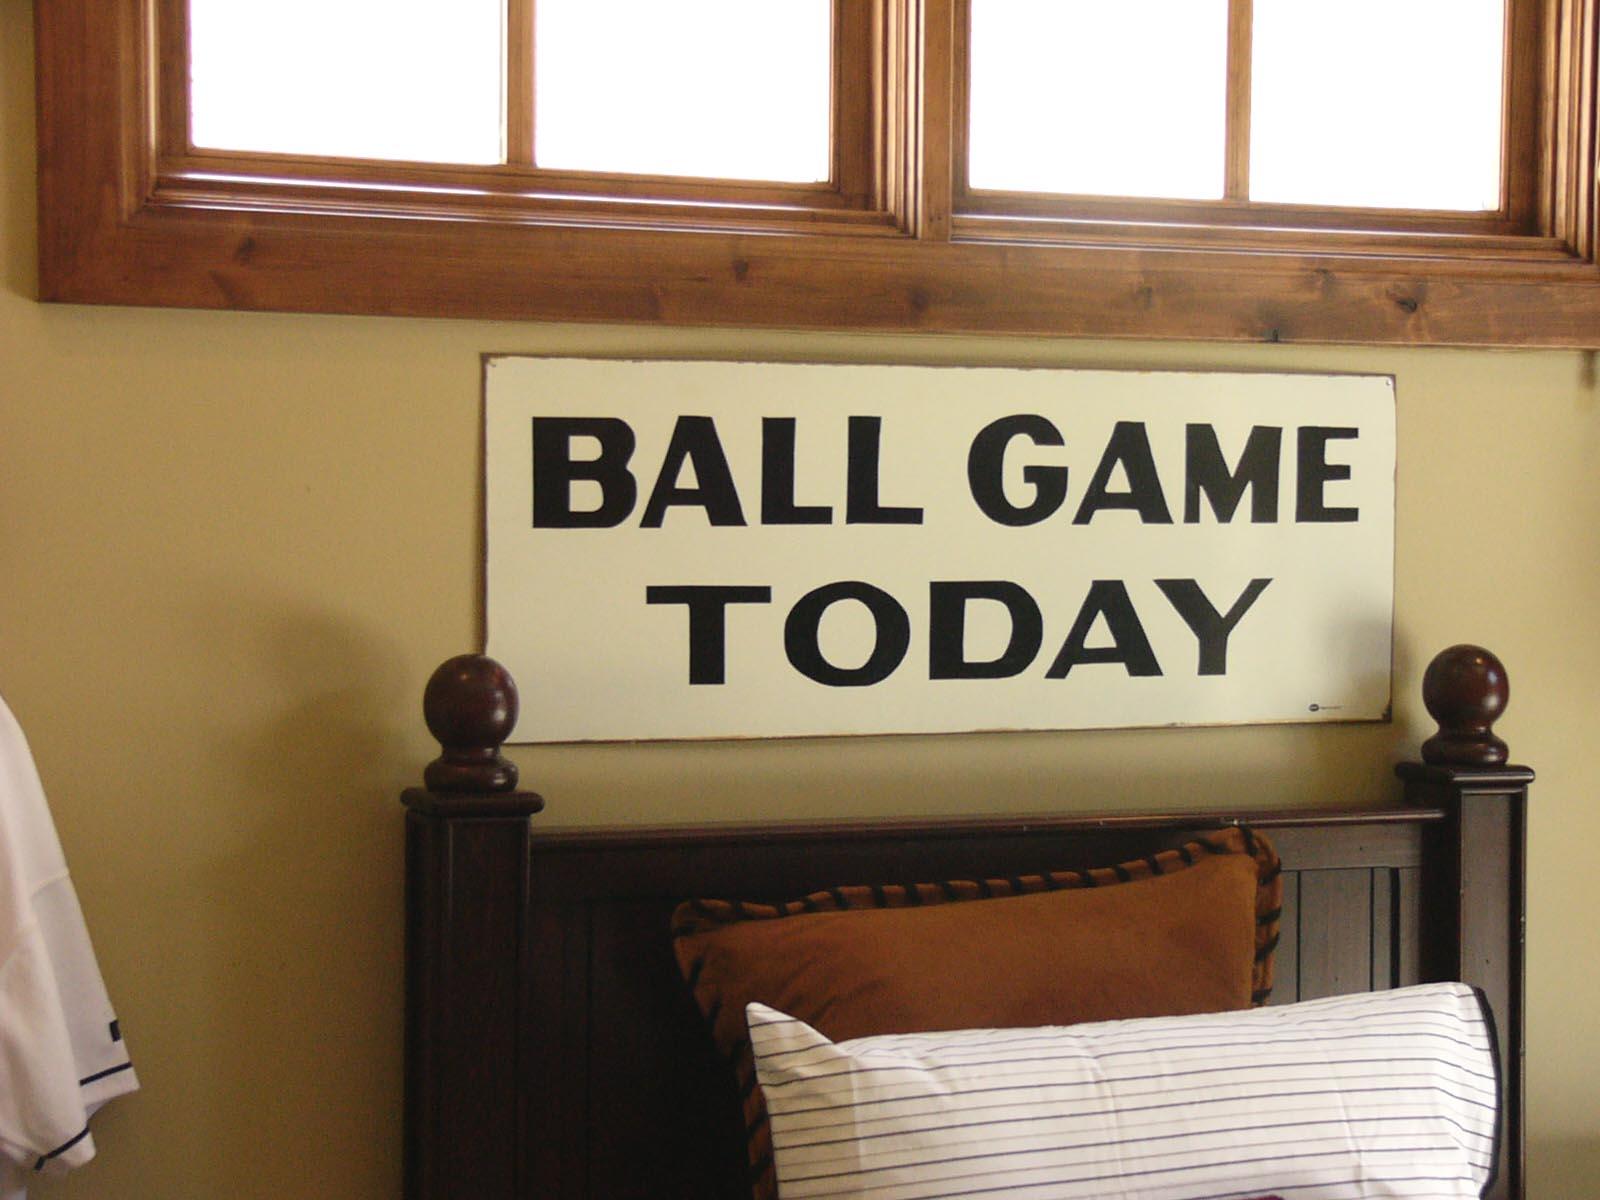 baseball signs boys bedrooms baseb rooms ball games boys sports